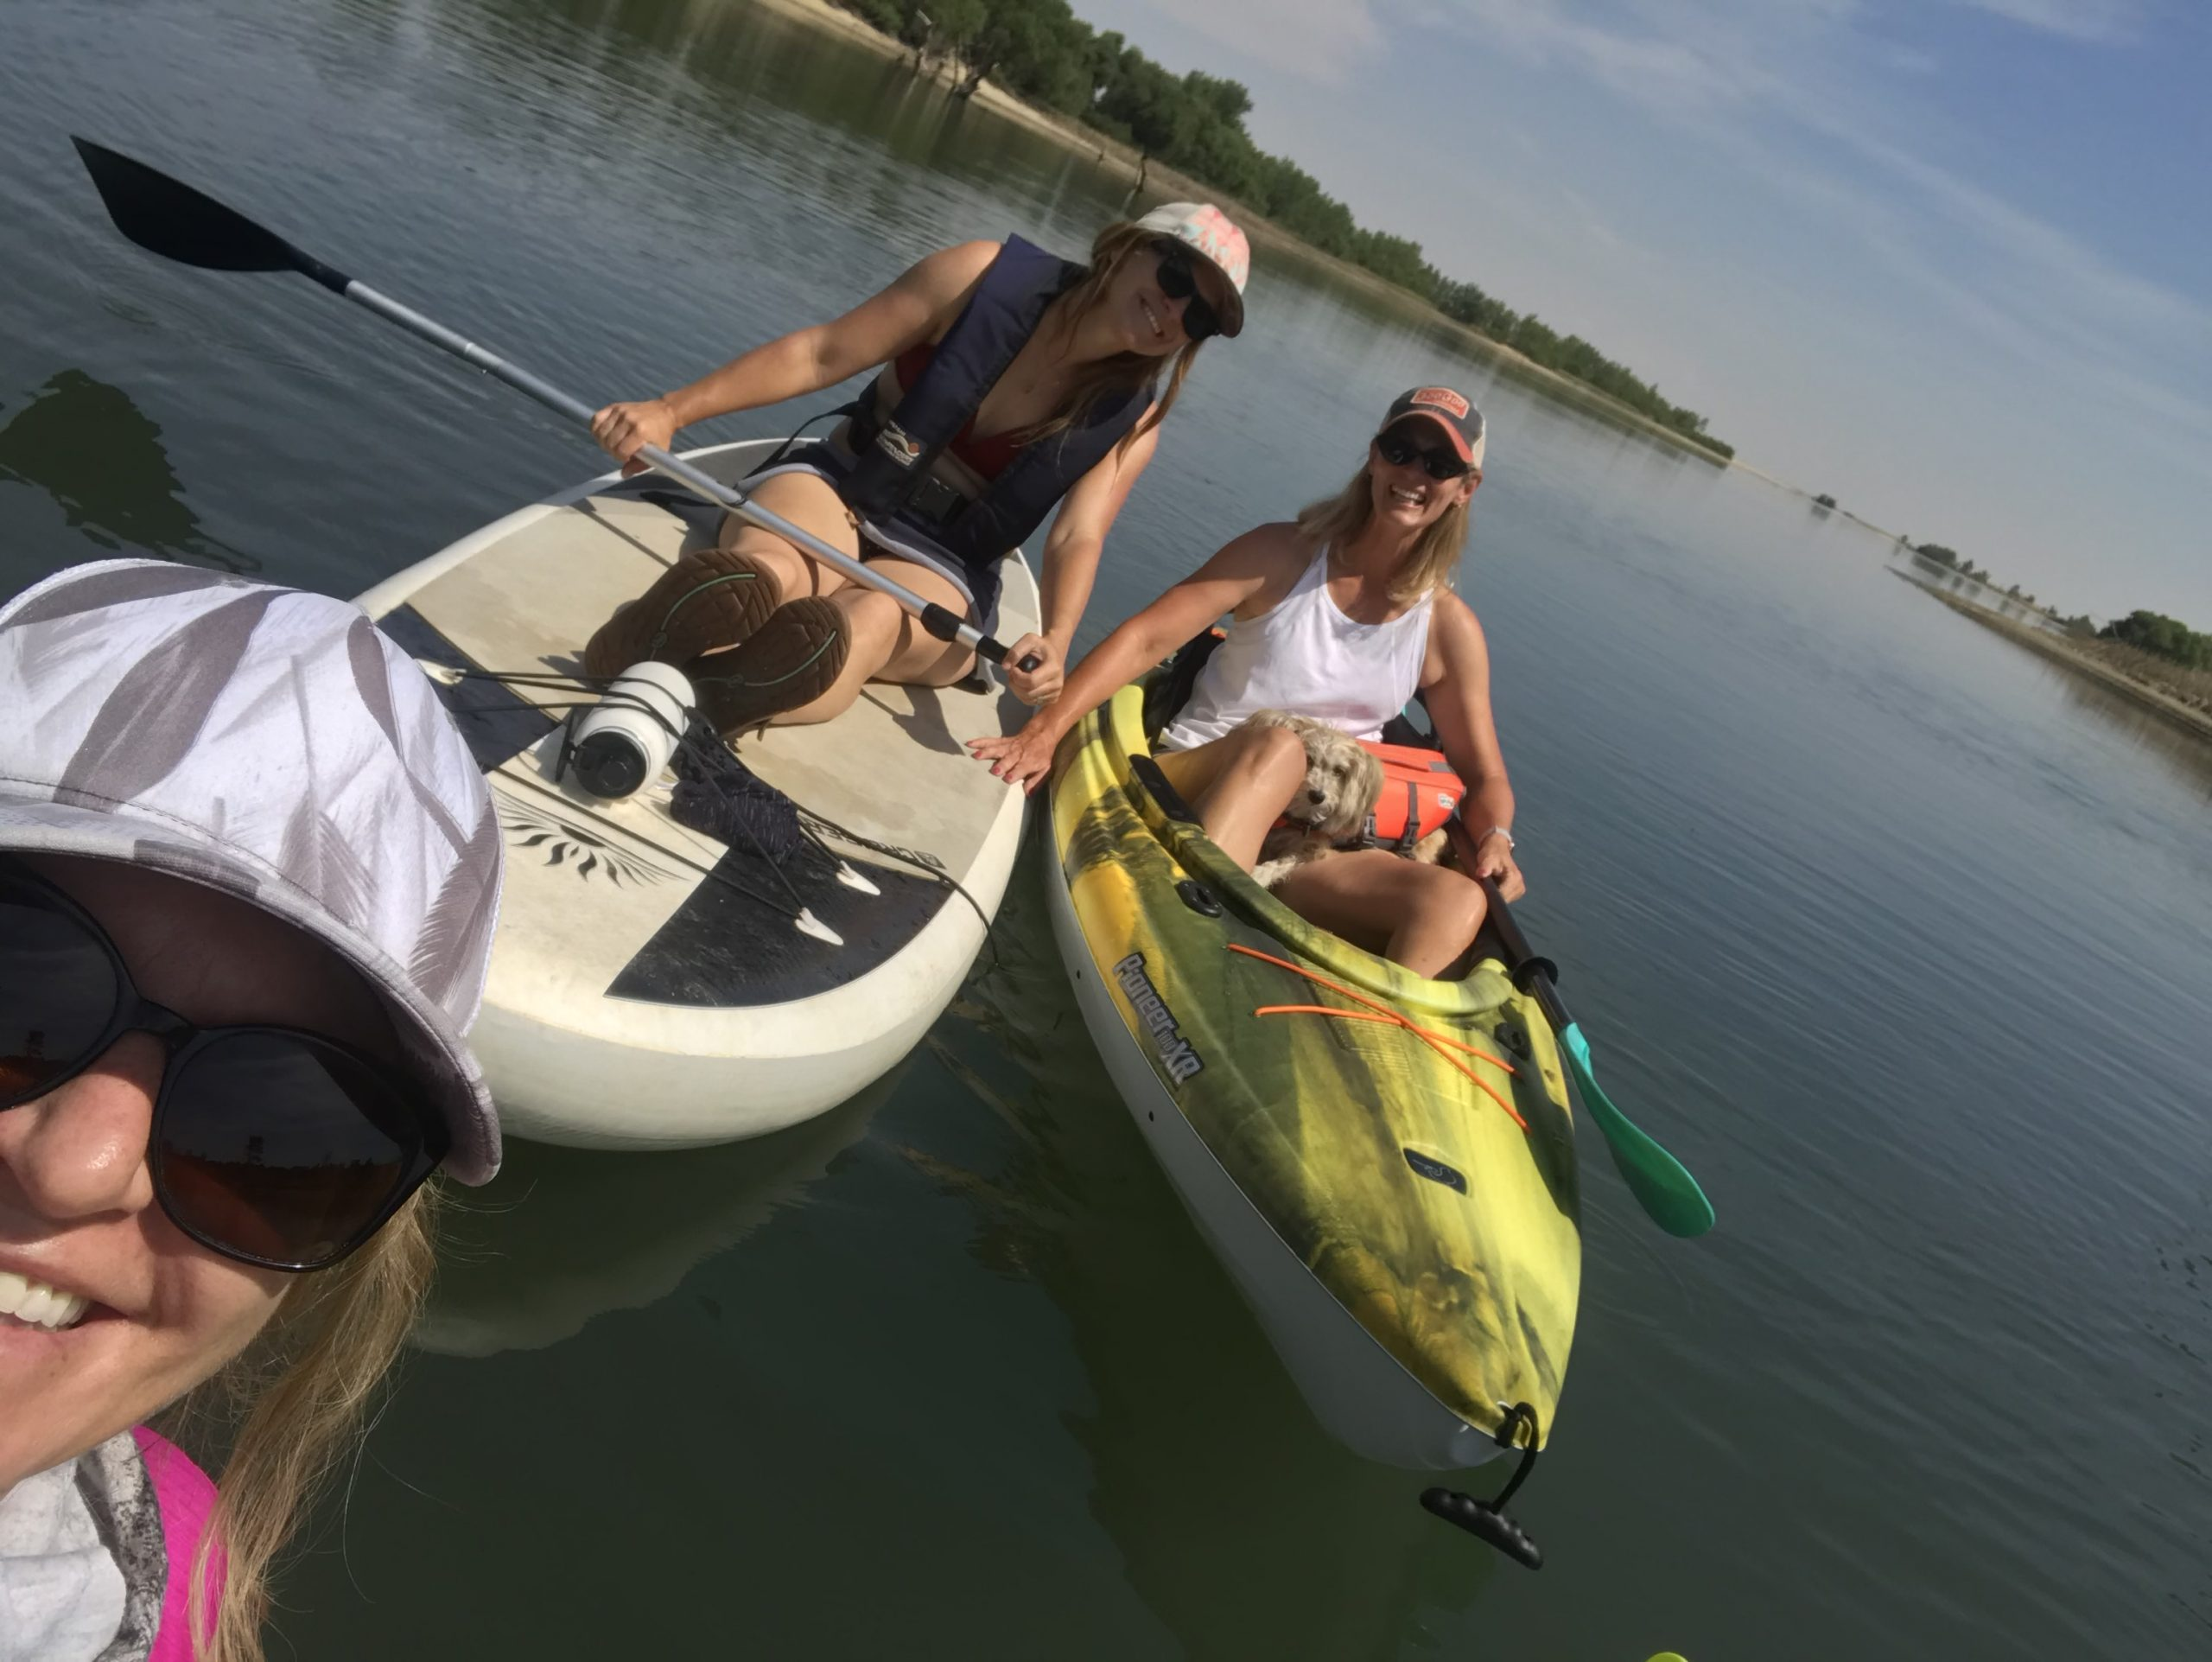 JVA grantwriters Kat, Erin and Lisa kayaking